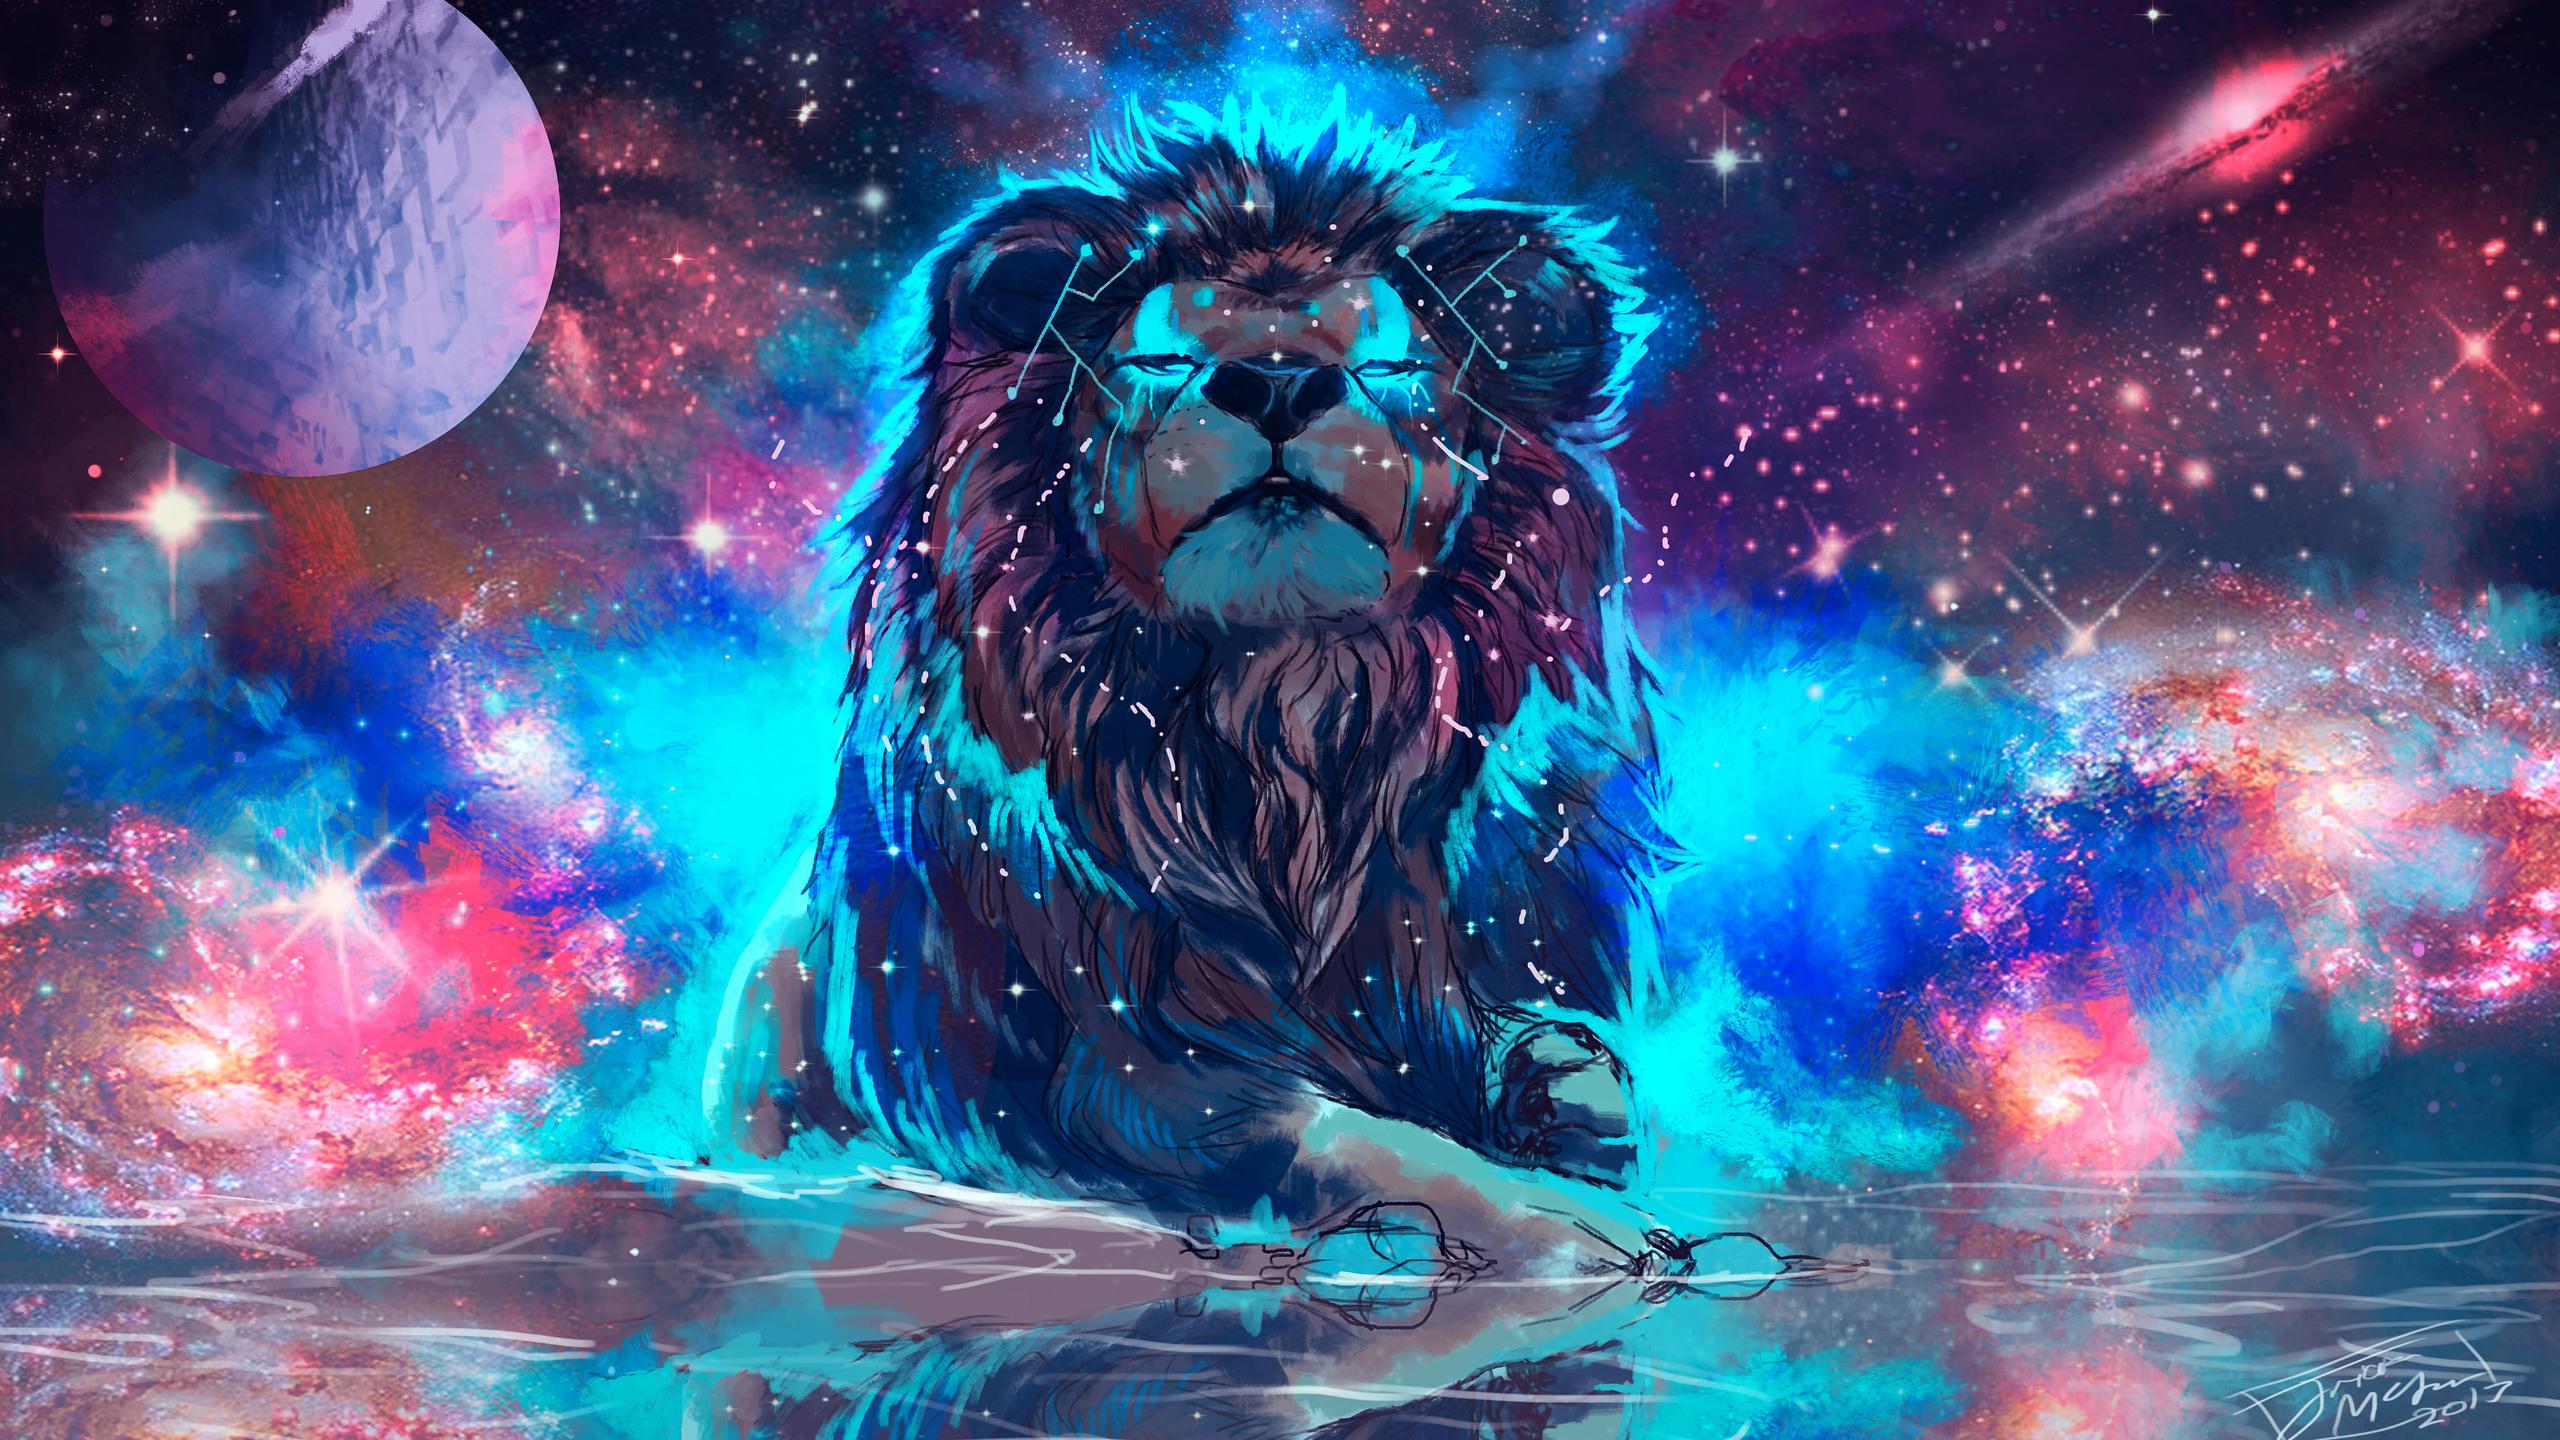 2560x1440 Lion 4k Artistic Colorful 1440P Resolution HD 4k ...